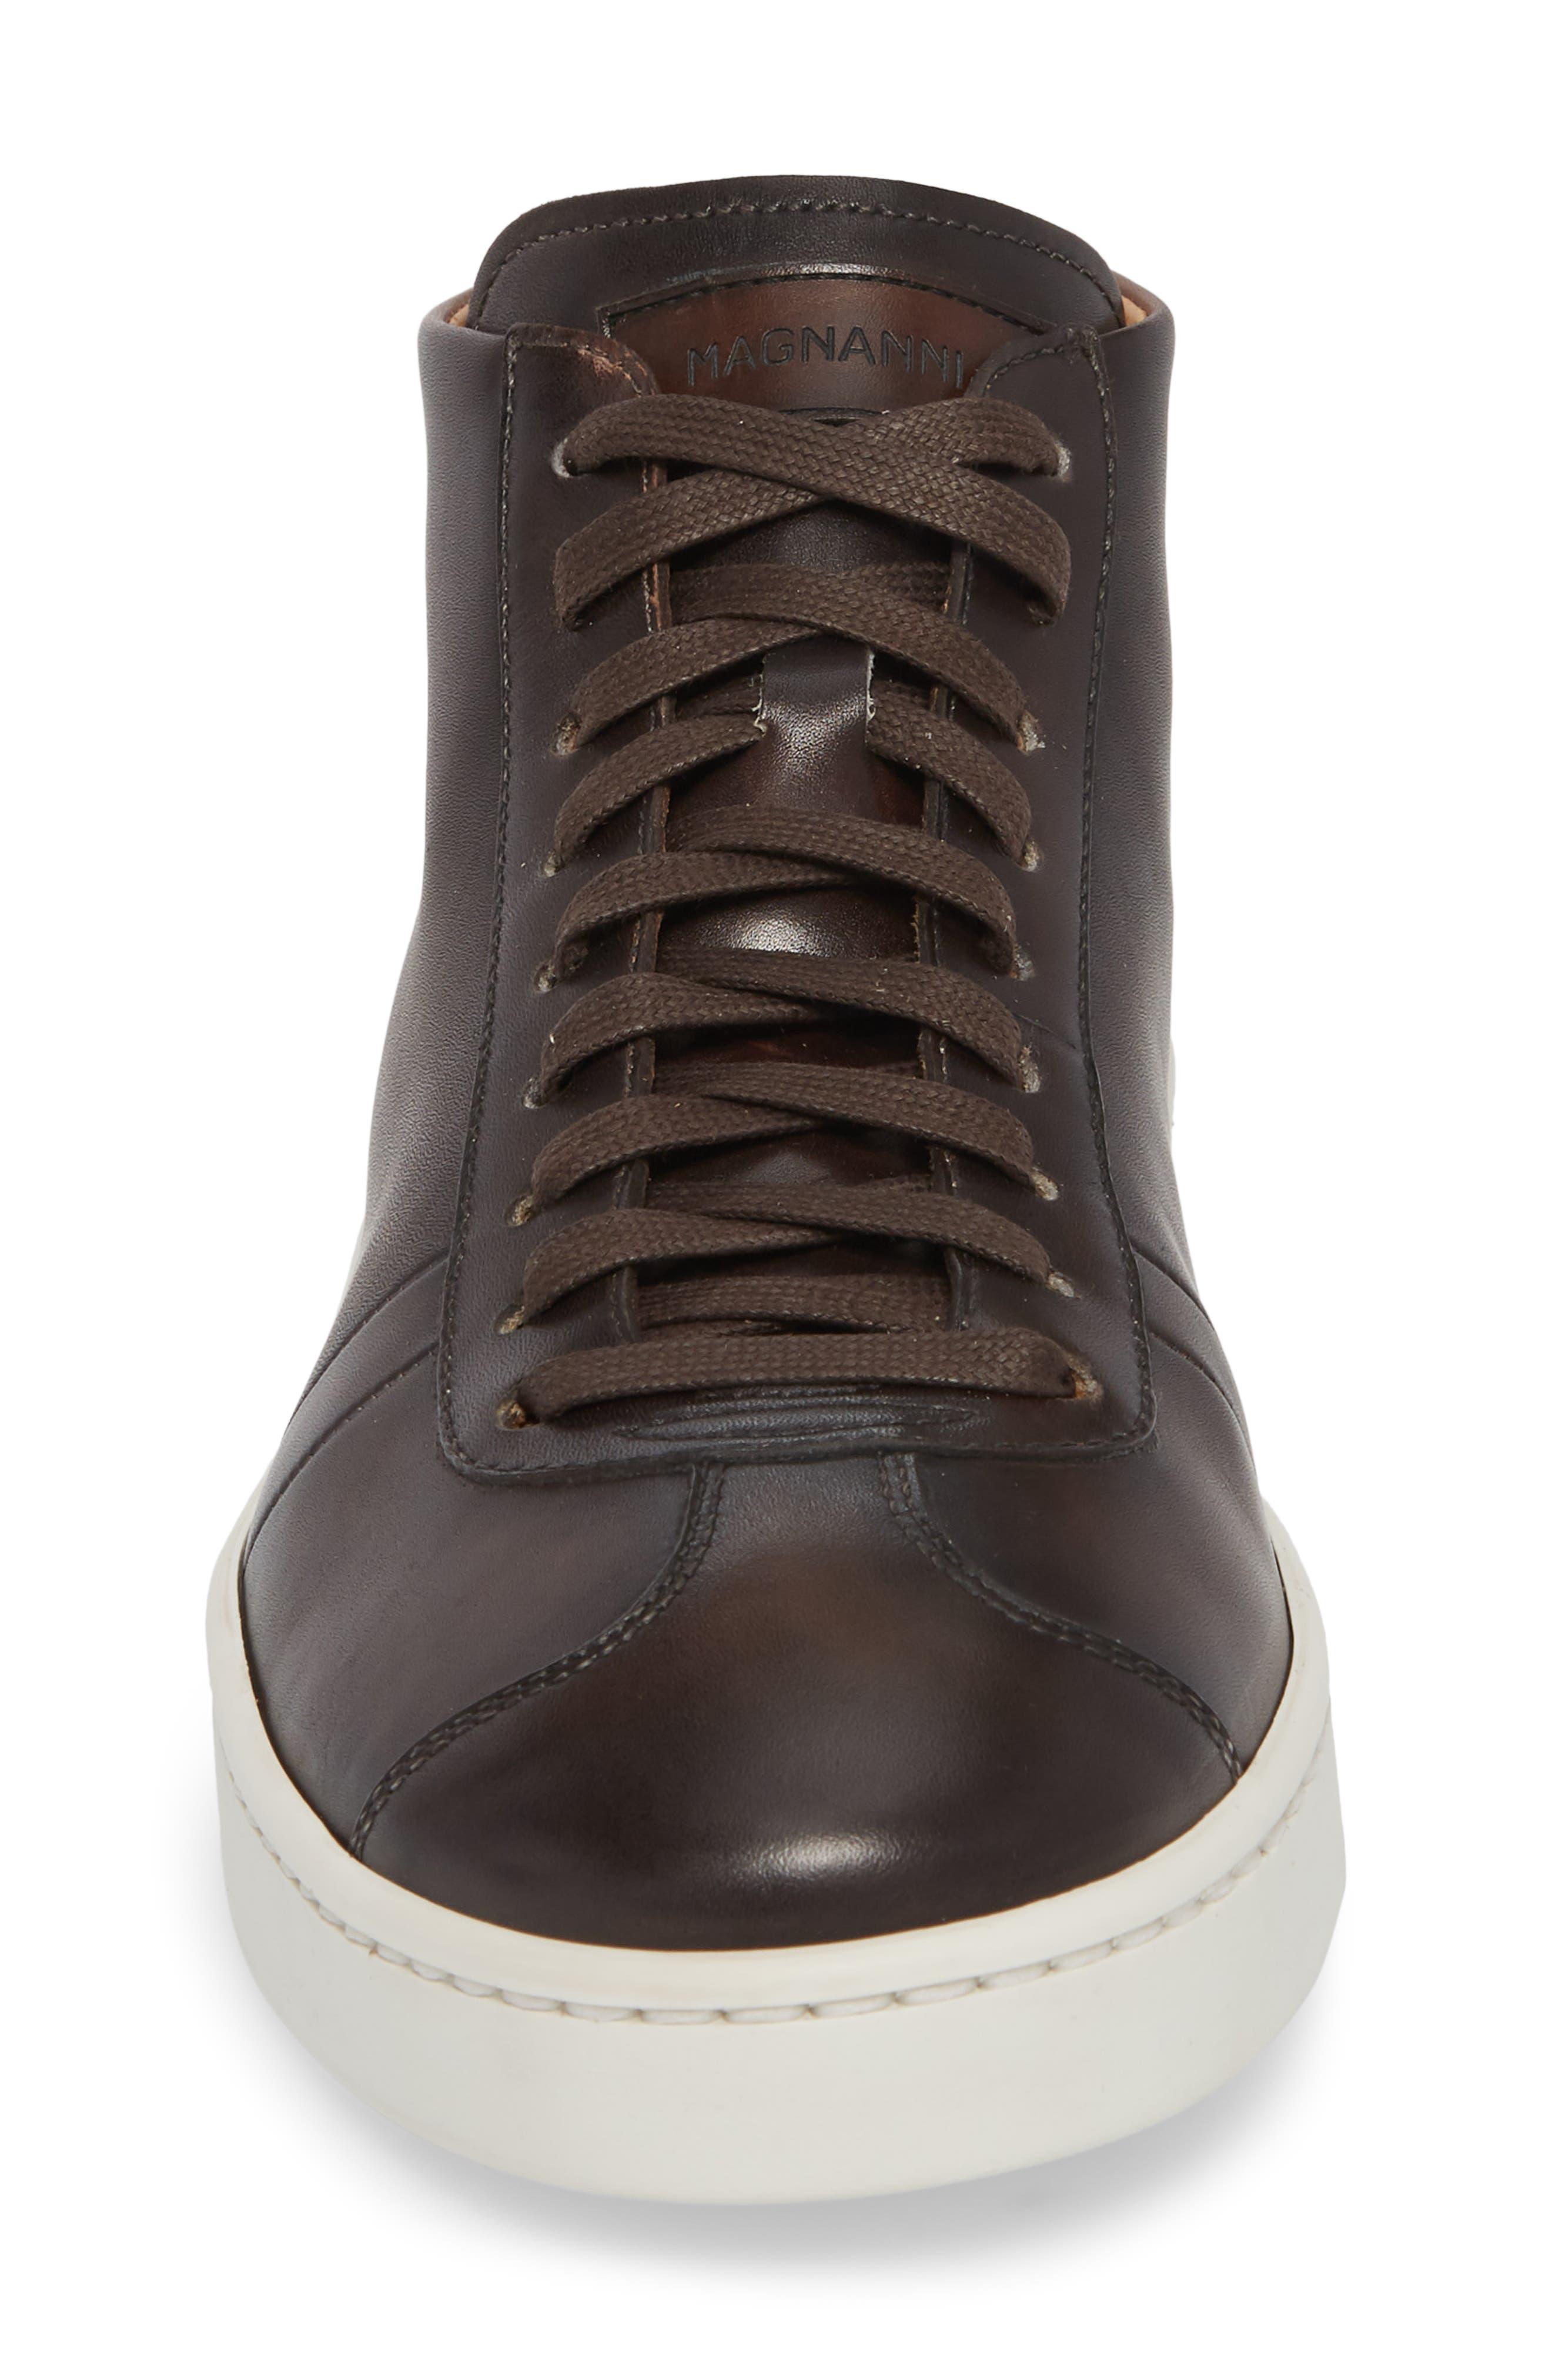 Gunner Mid Top Sneaker,                             Alternate thumbnail 4, color,                             Brown Leather